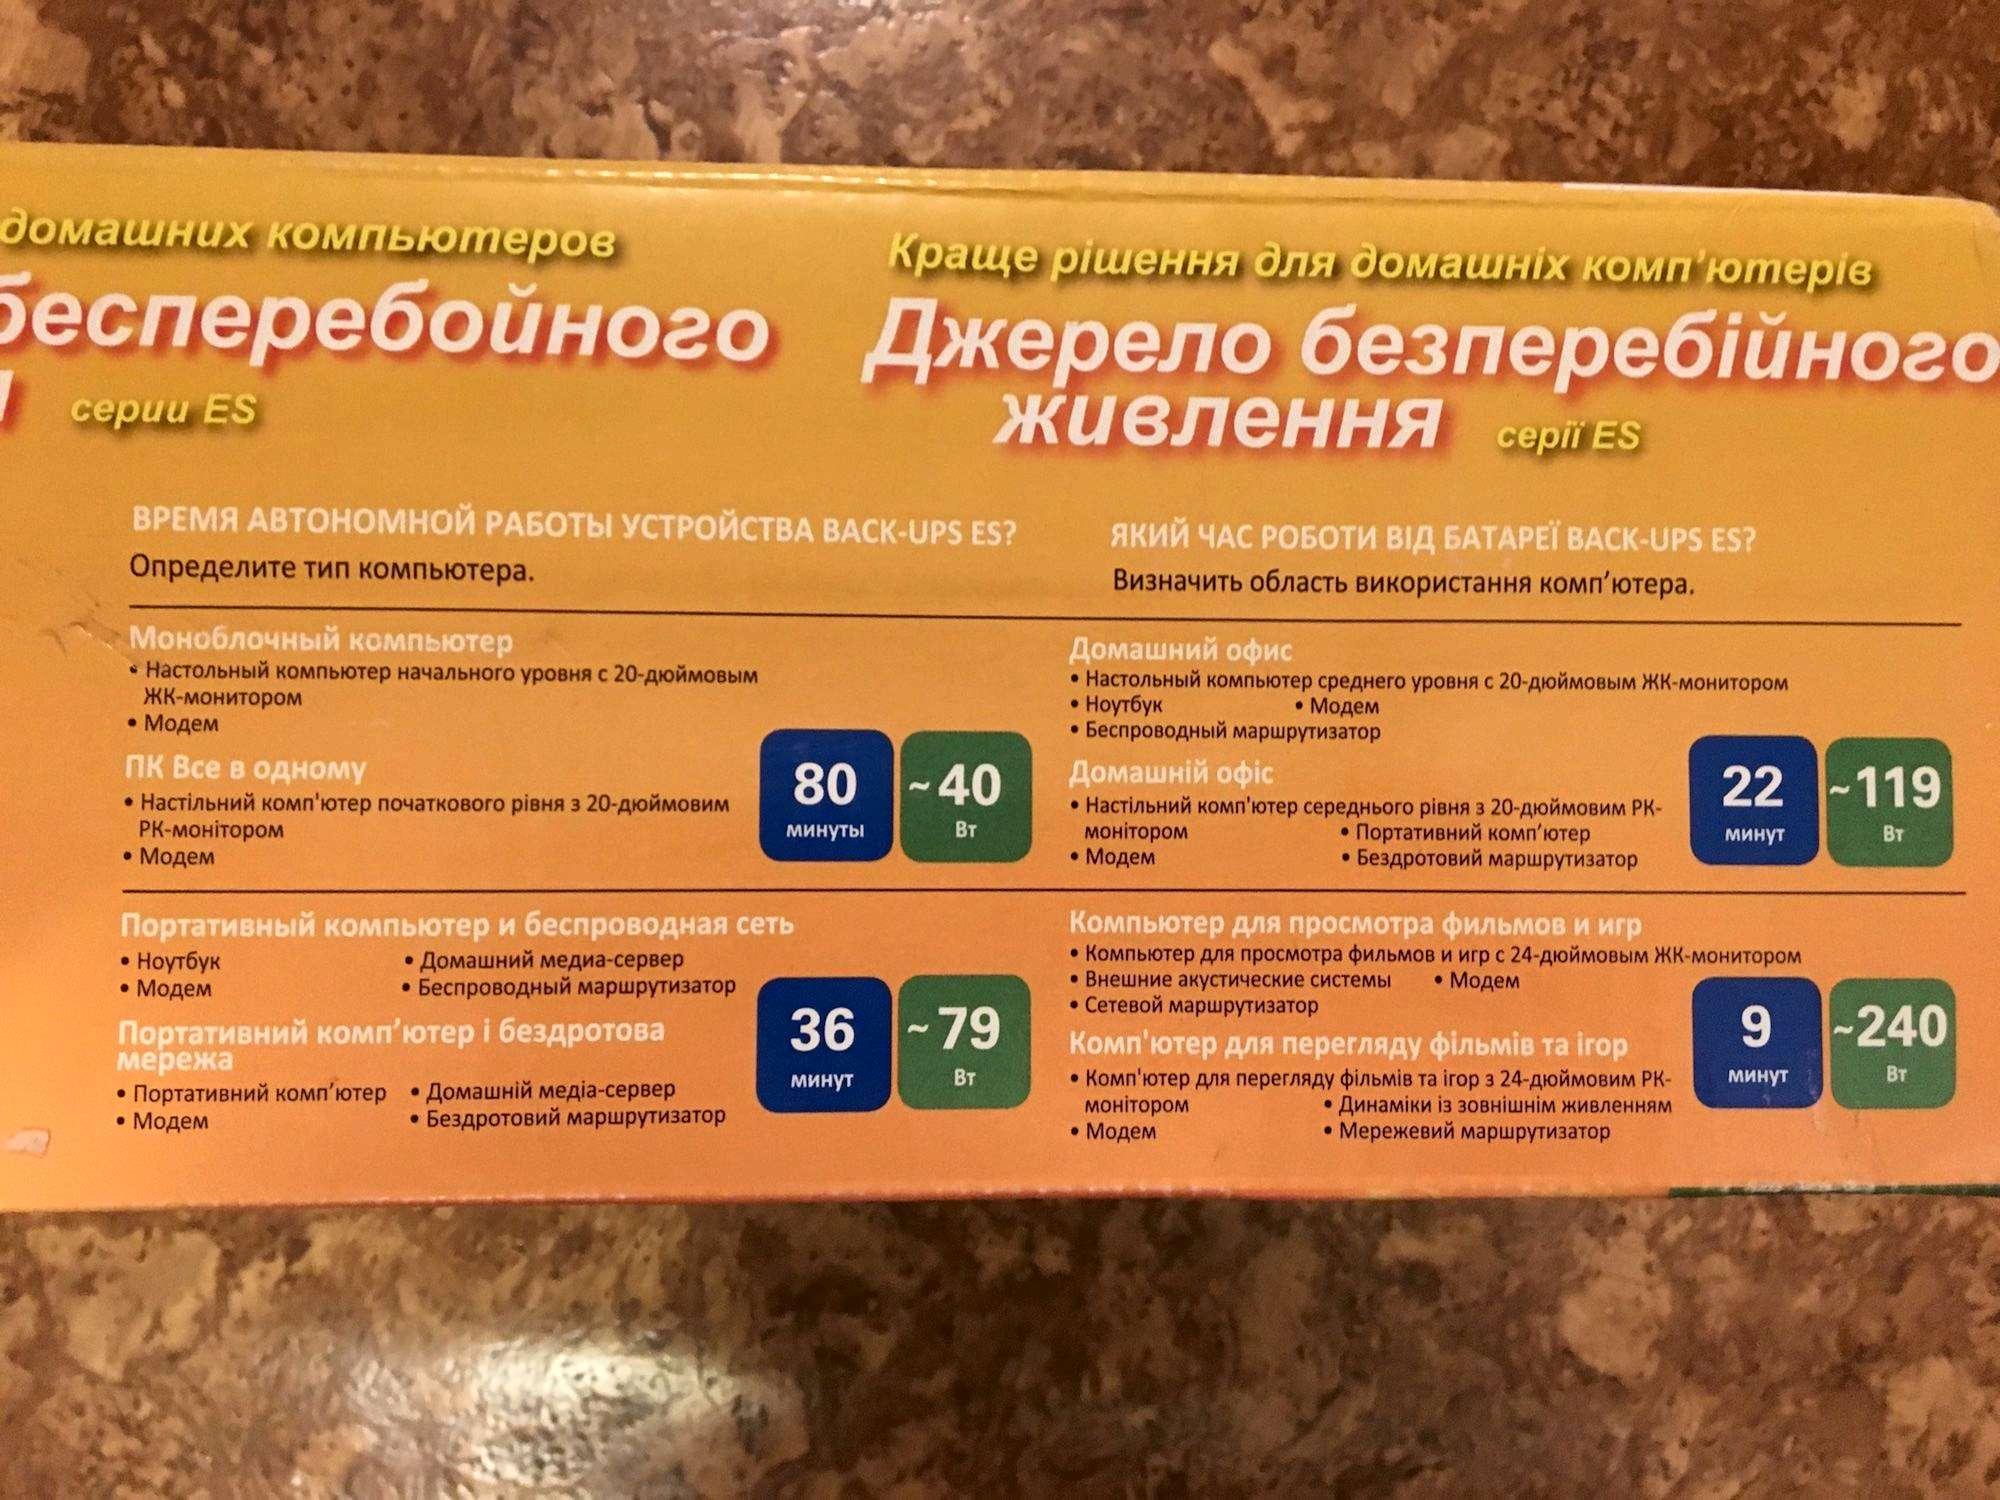 apc back-ups 500 инструкция на русском